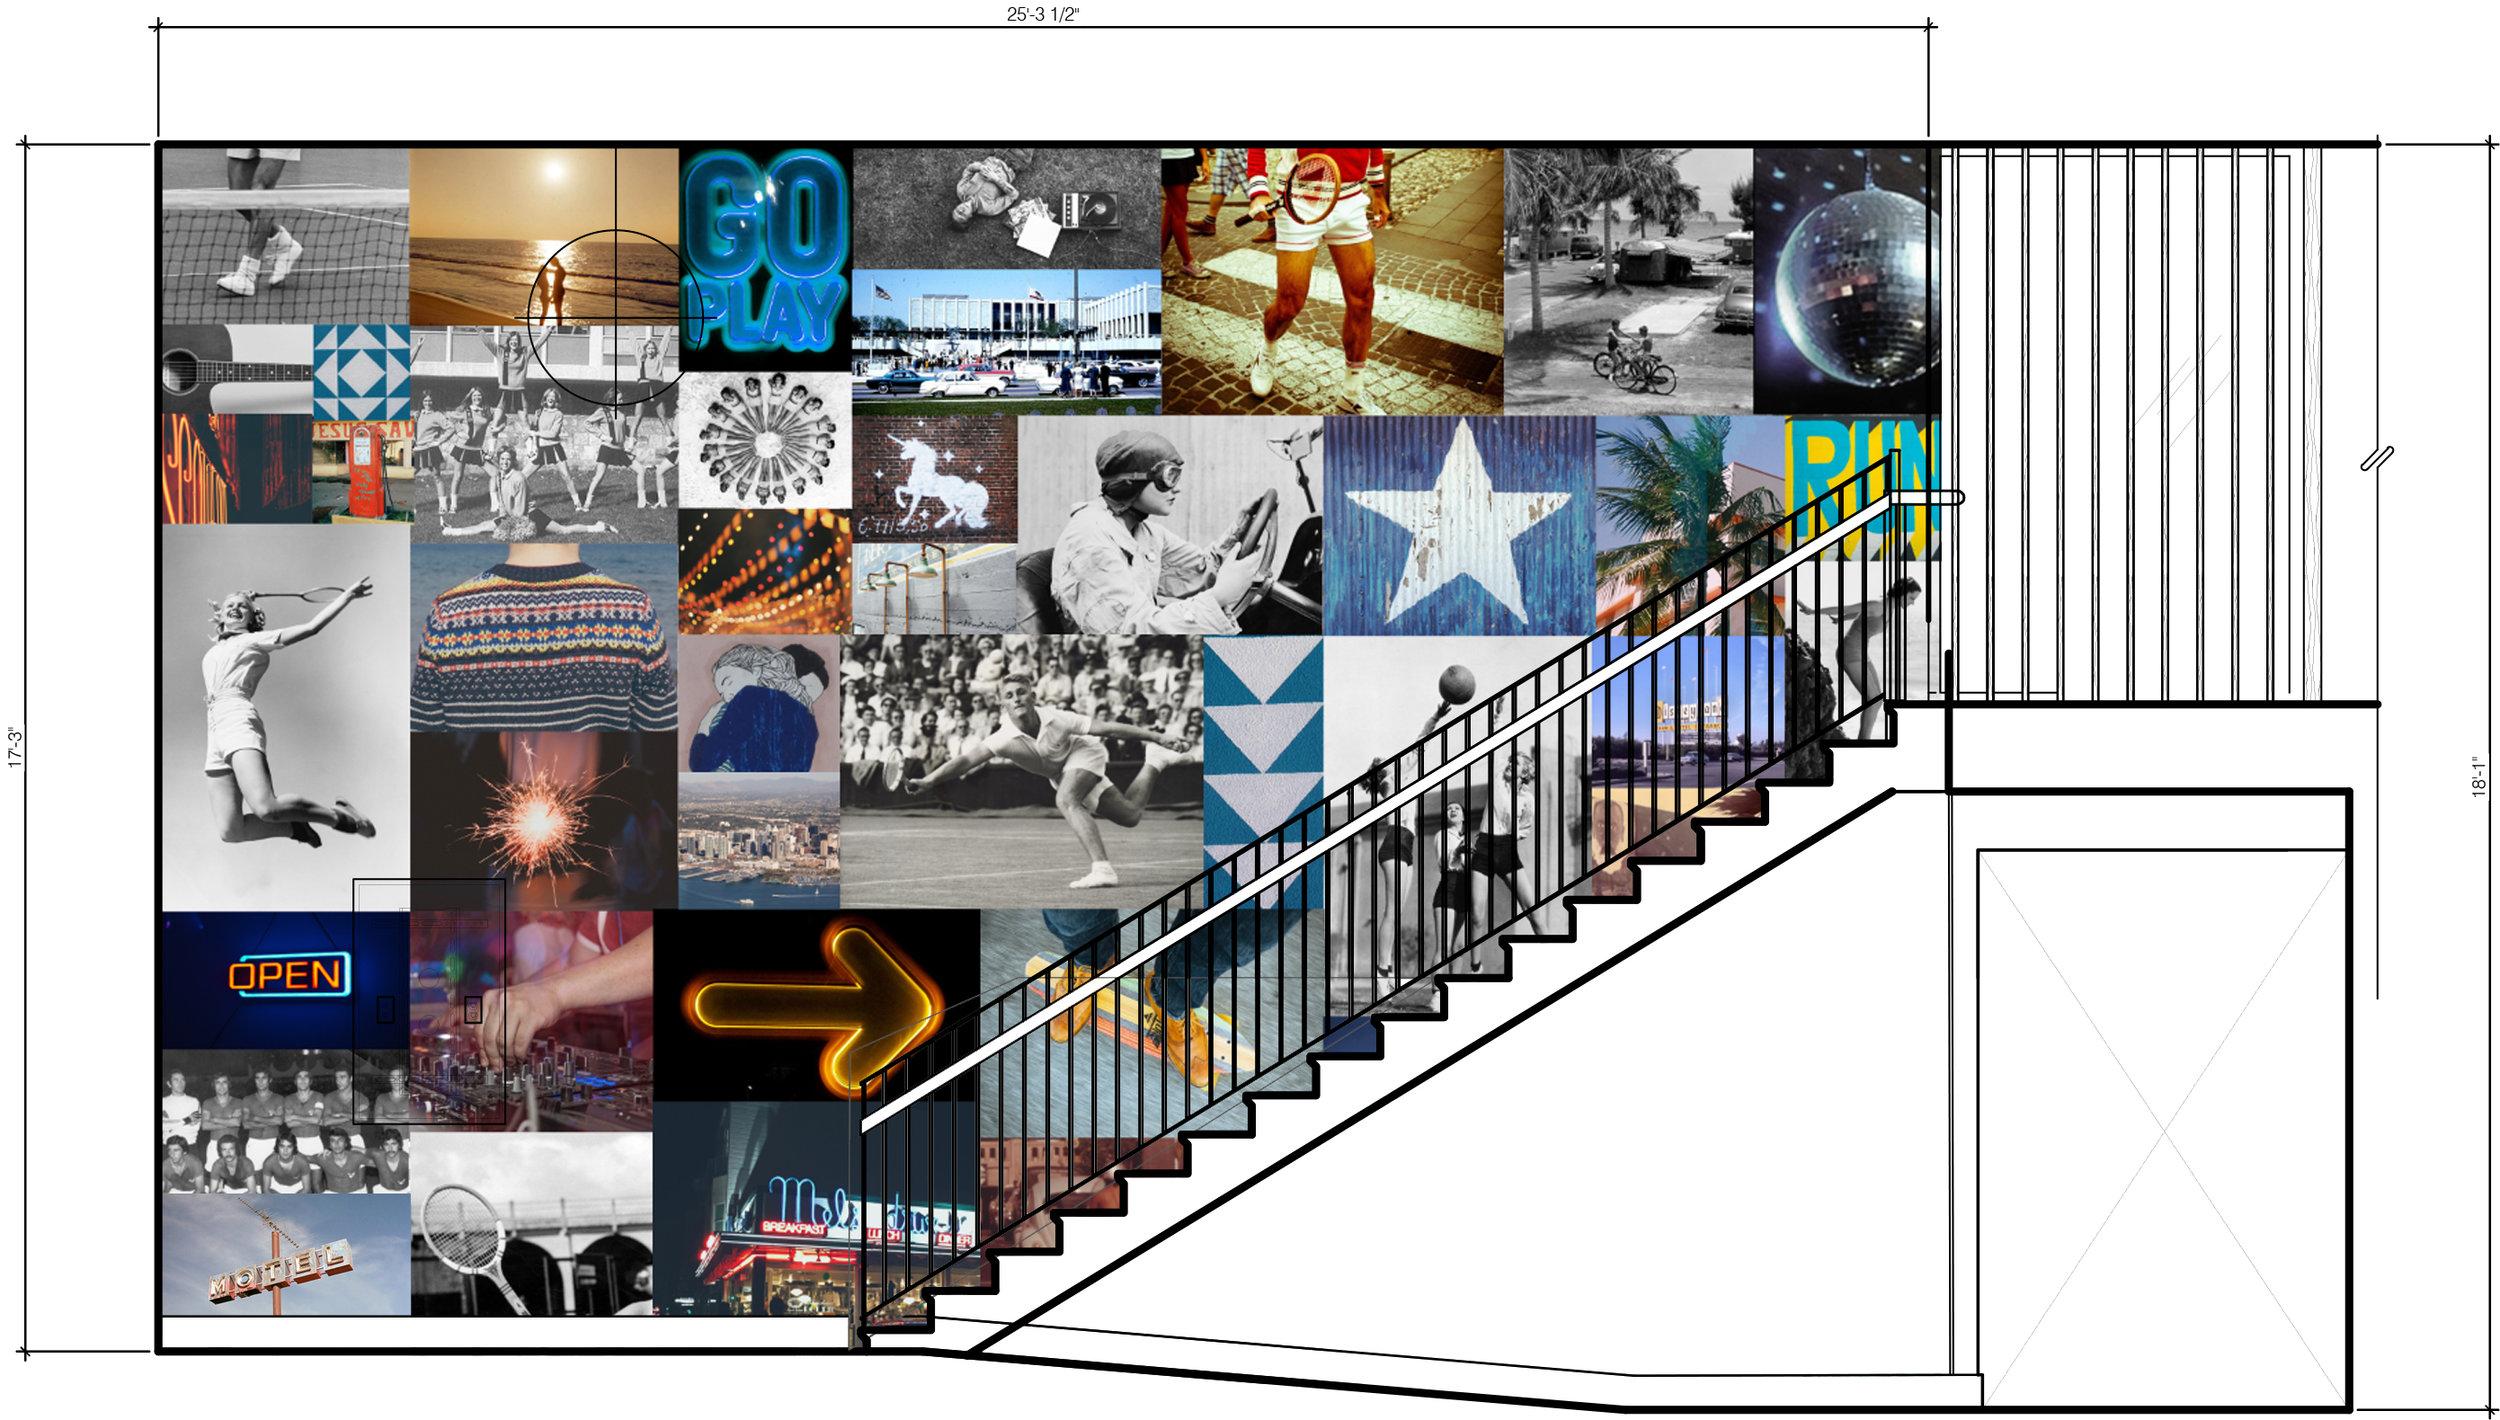 Griffin Club - Mural Wallcovering Elevation - Artwork2.jpg